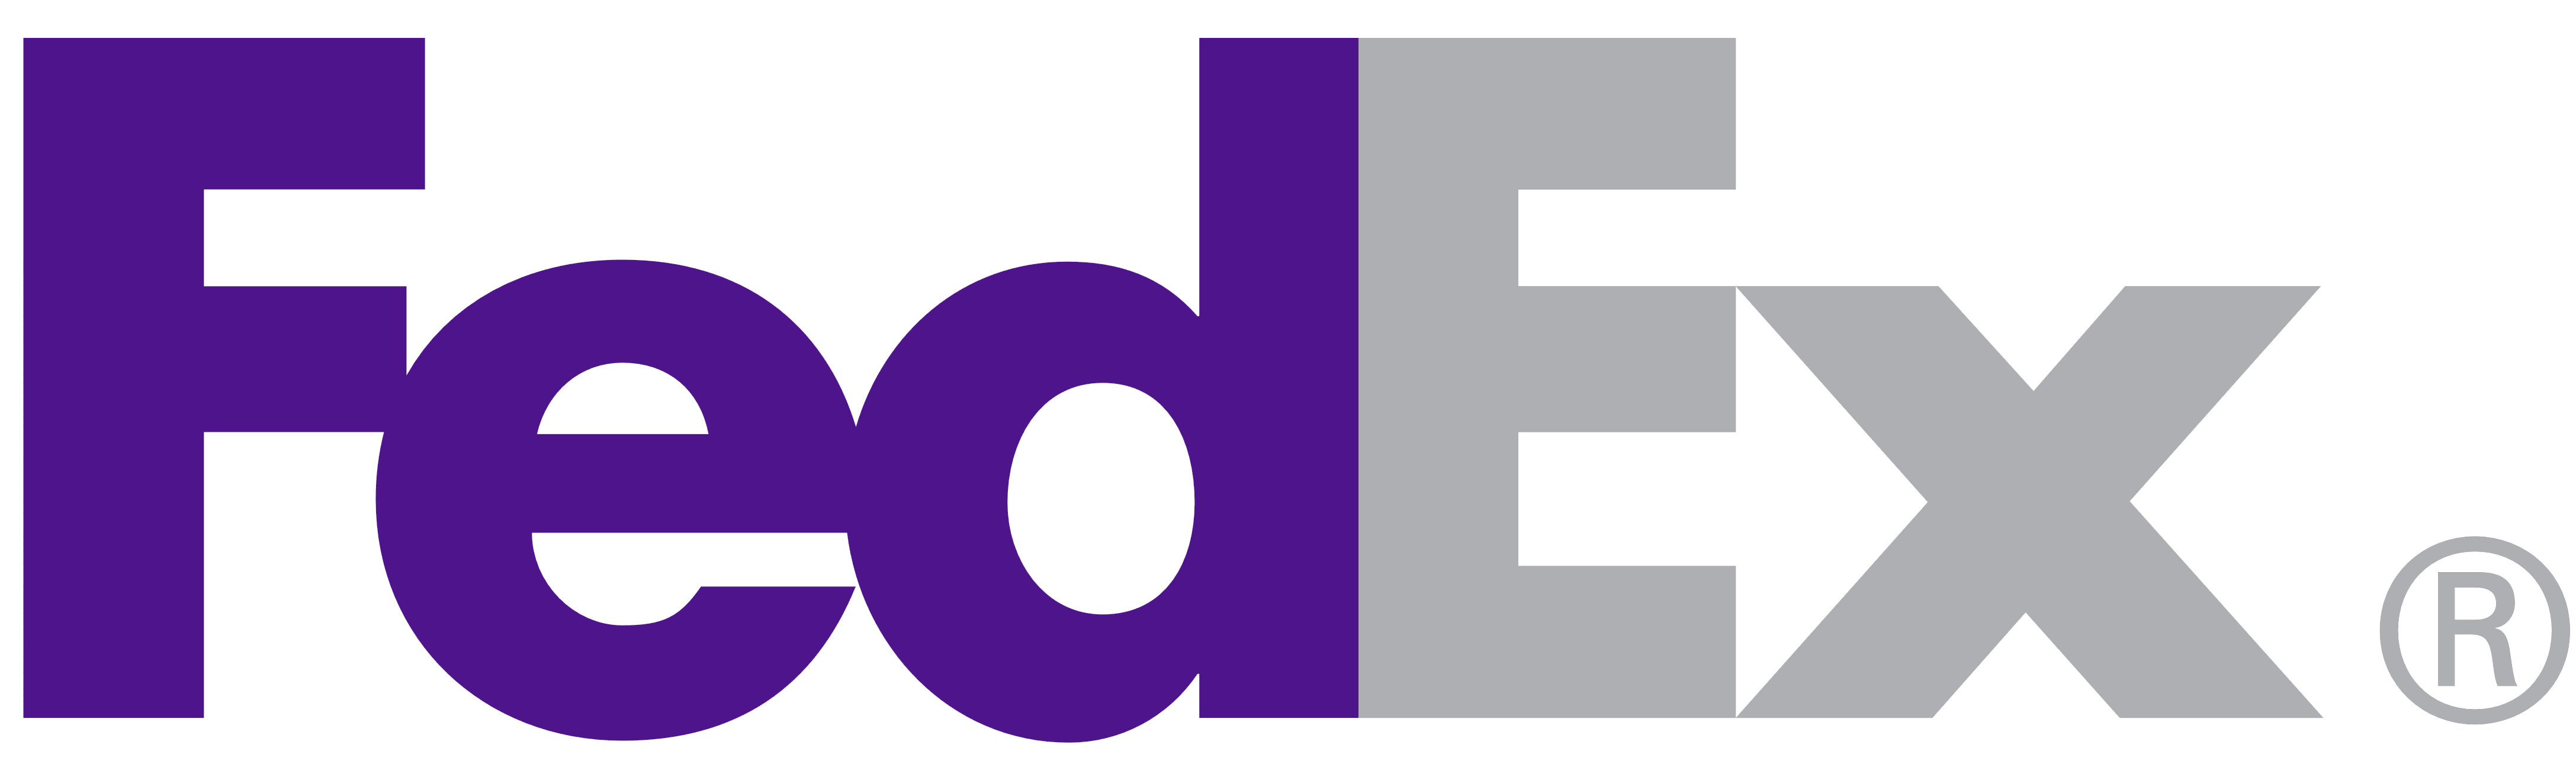 fedex logos download rh logos download com